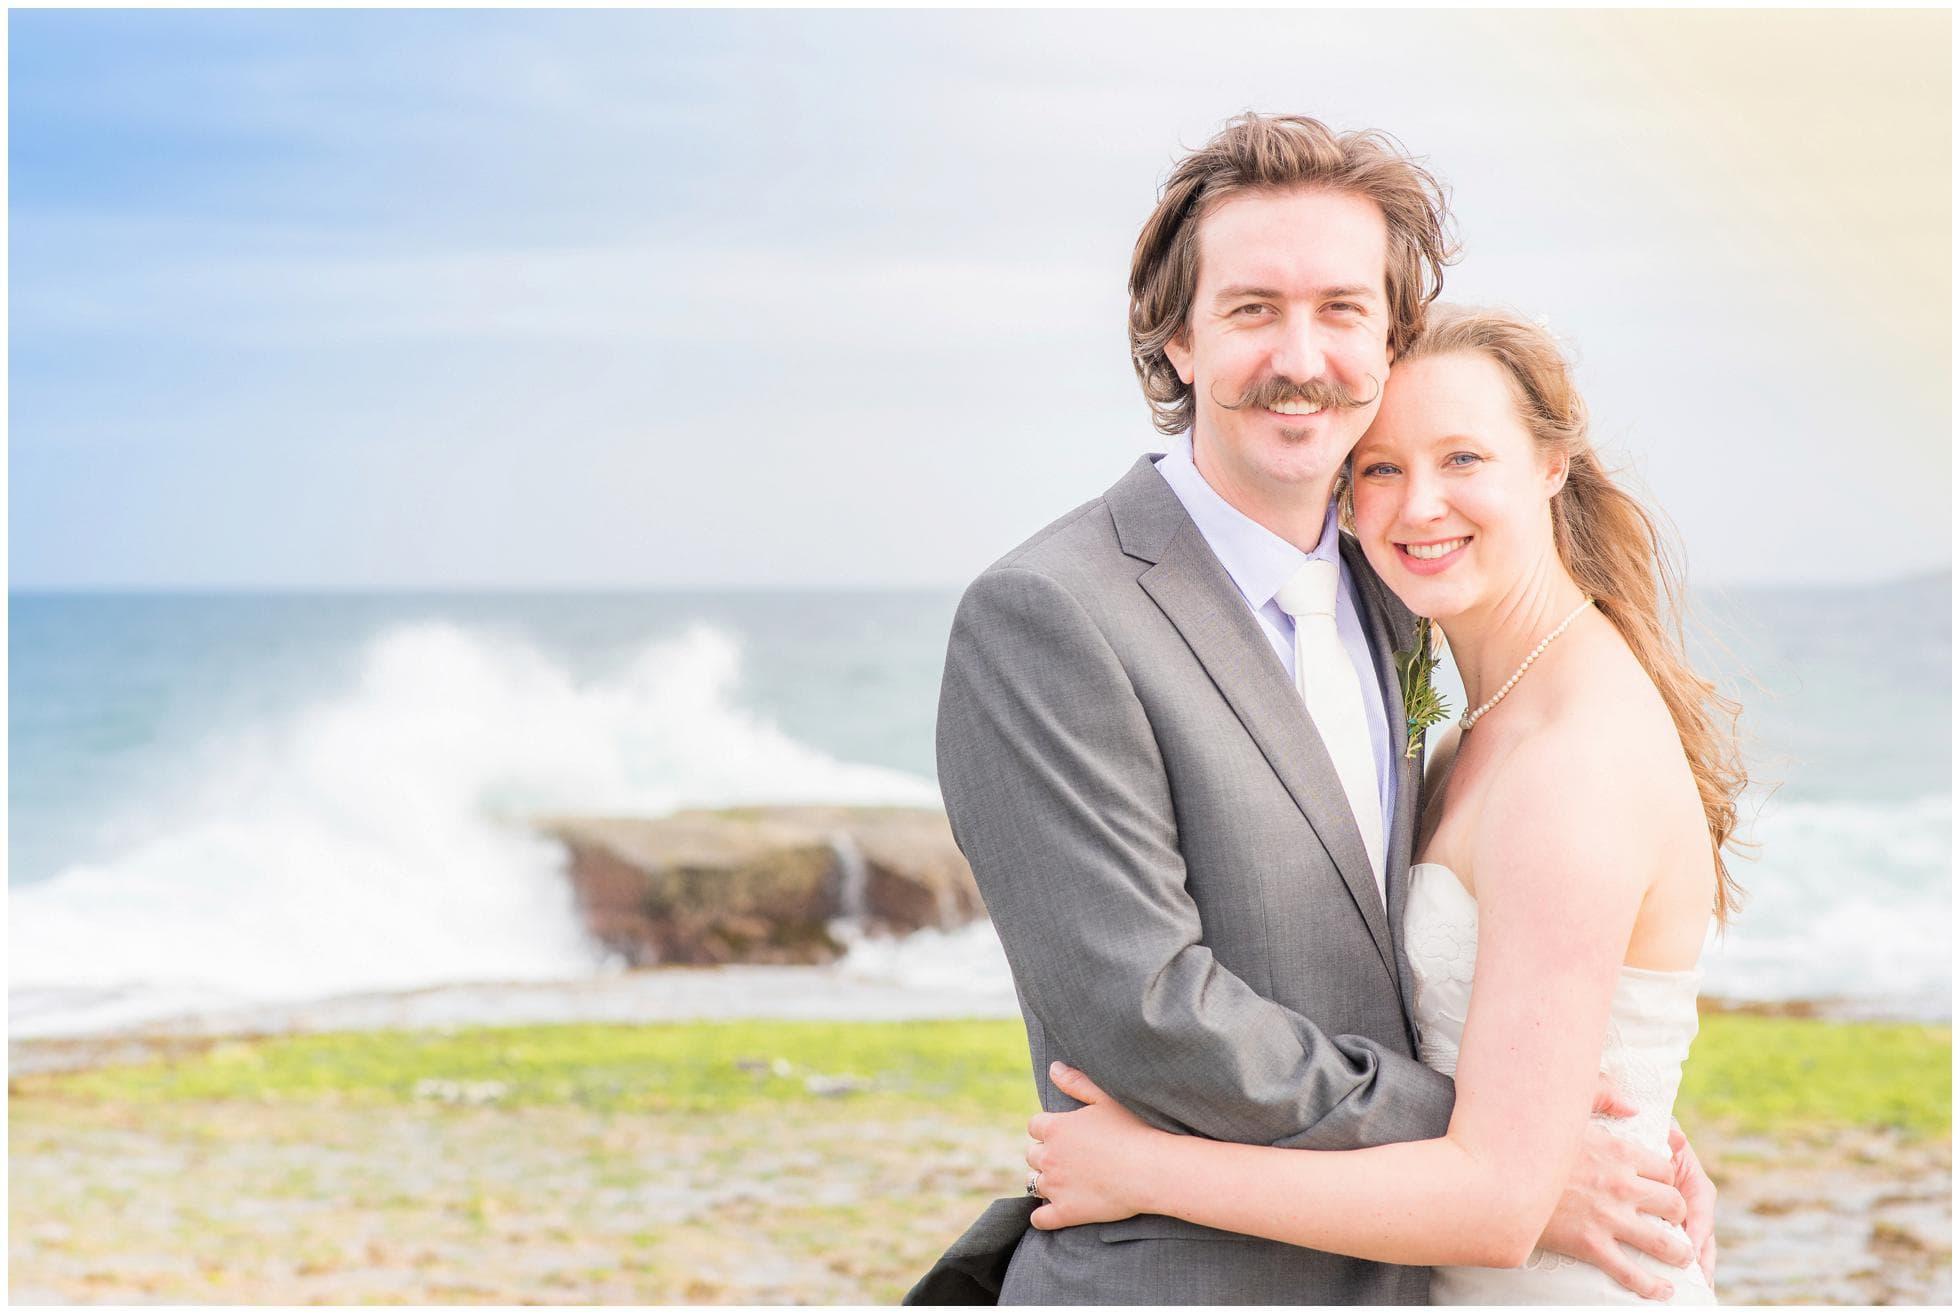 Classic Sydney wedding photography of bride and groom on Mona Vale beach